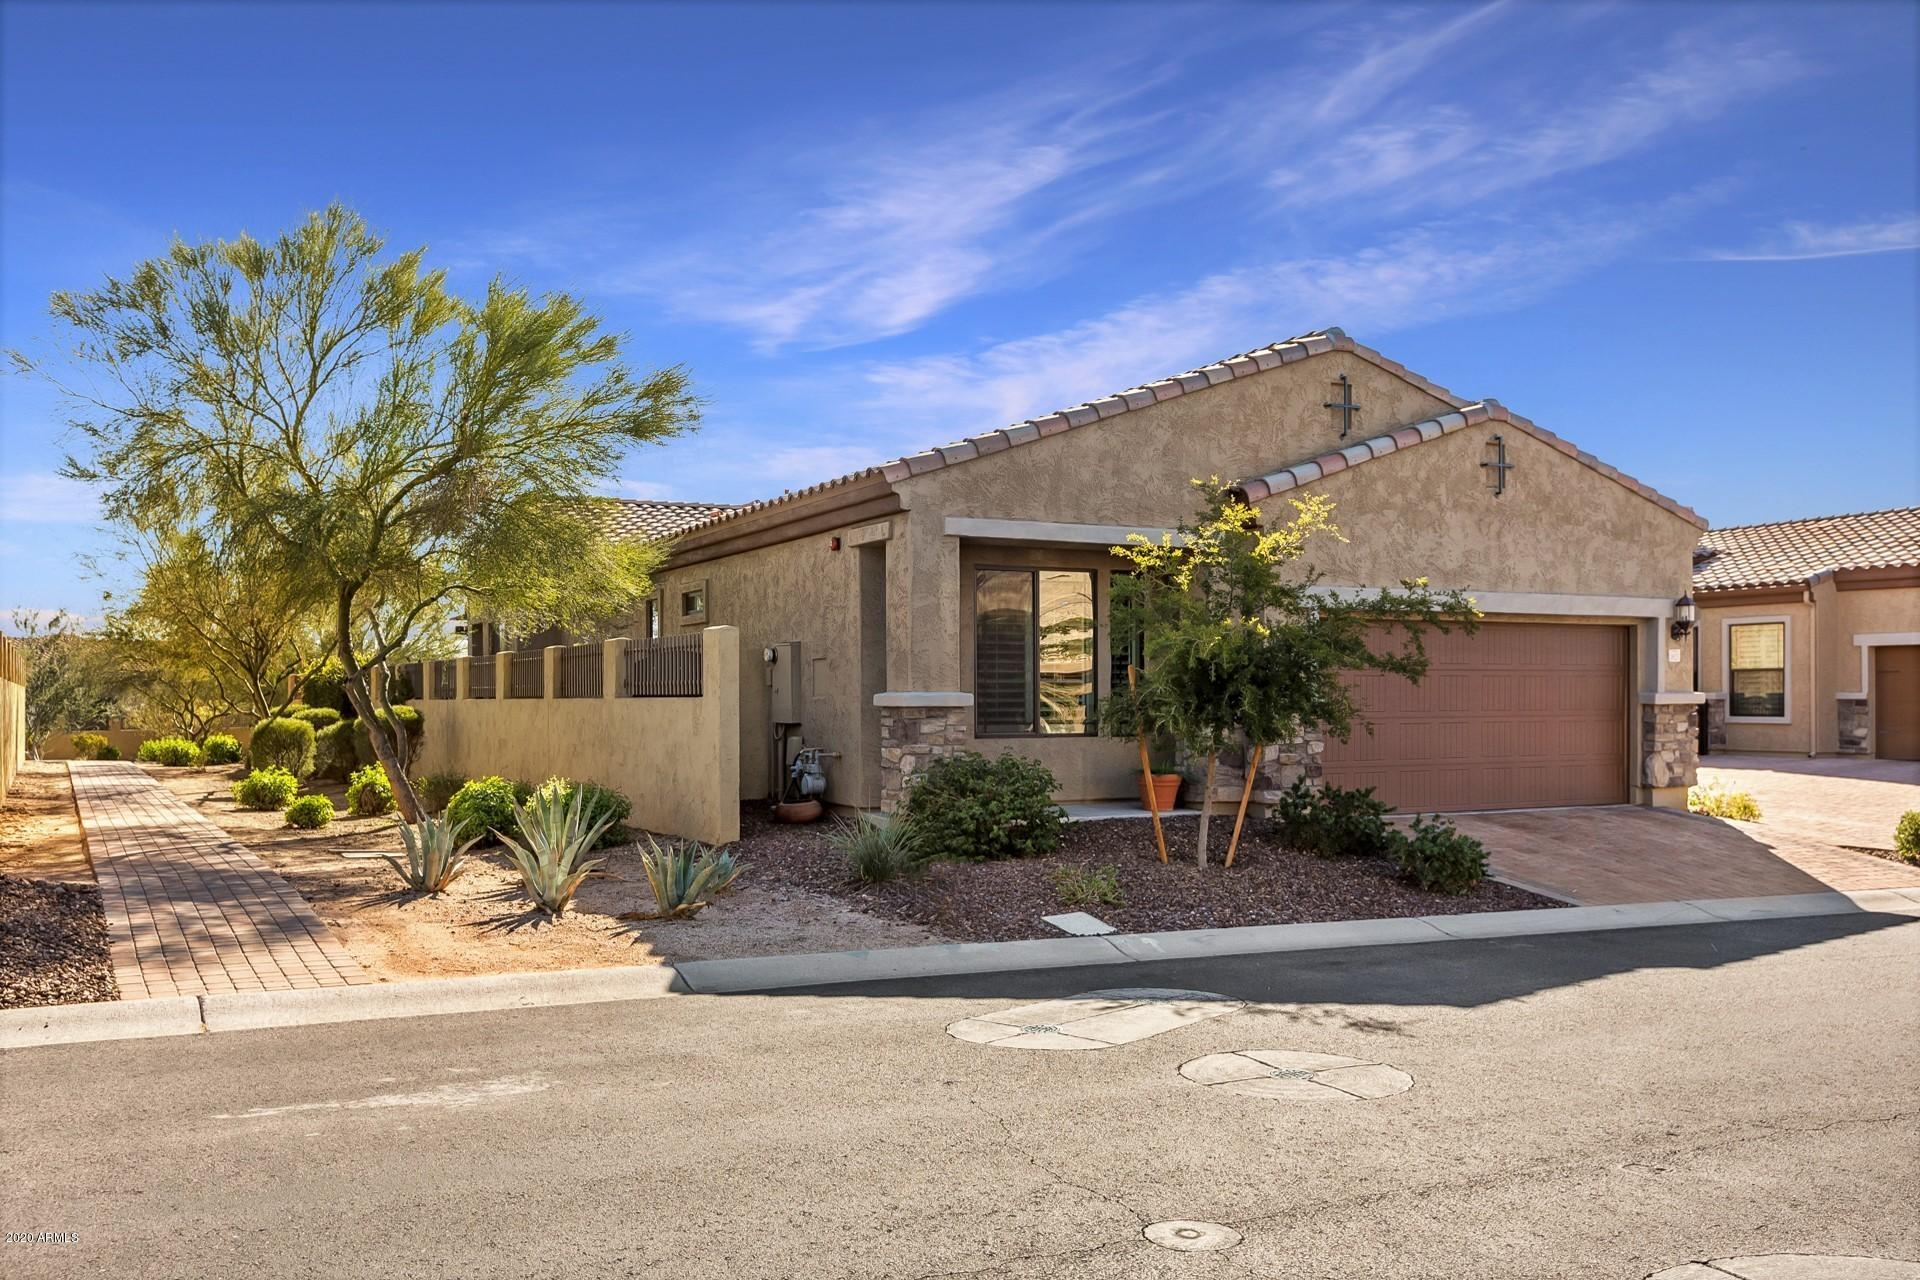 Photo of 1821 N RED CLIFF --, Mesa, AZ 85207